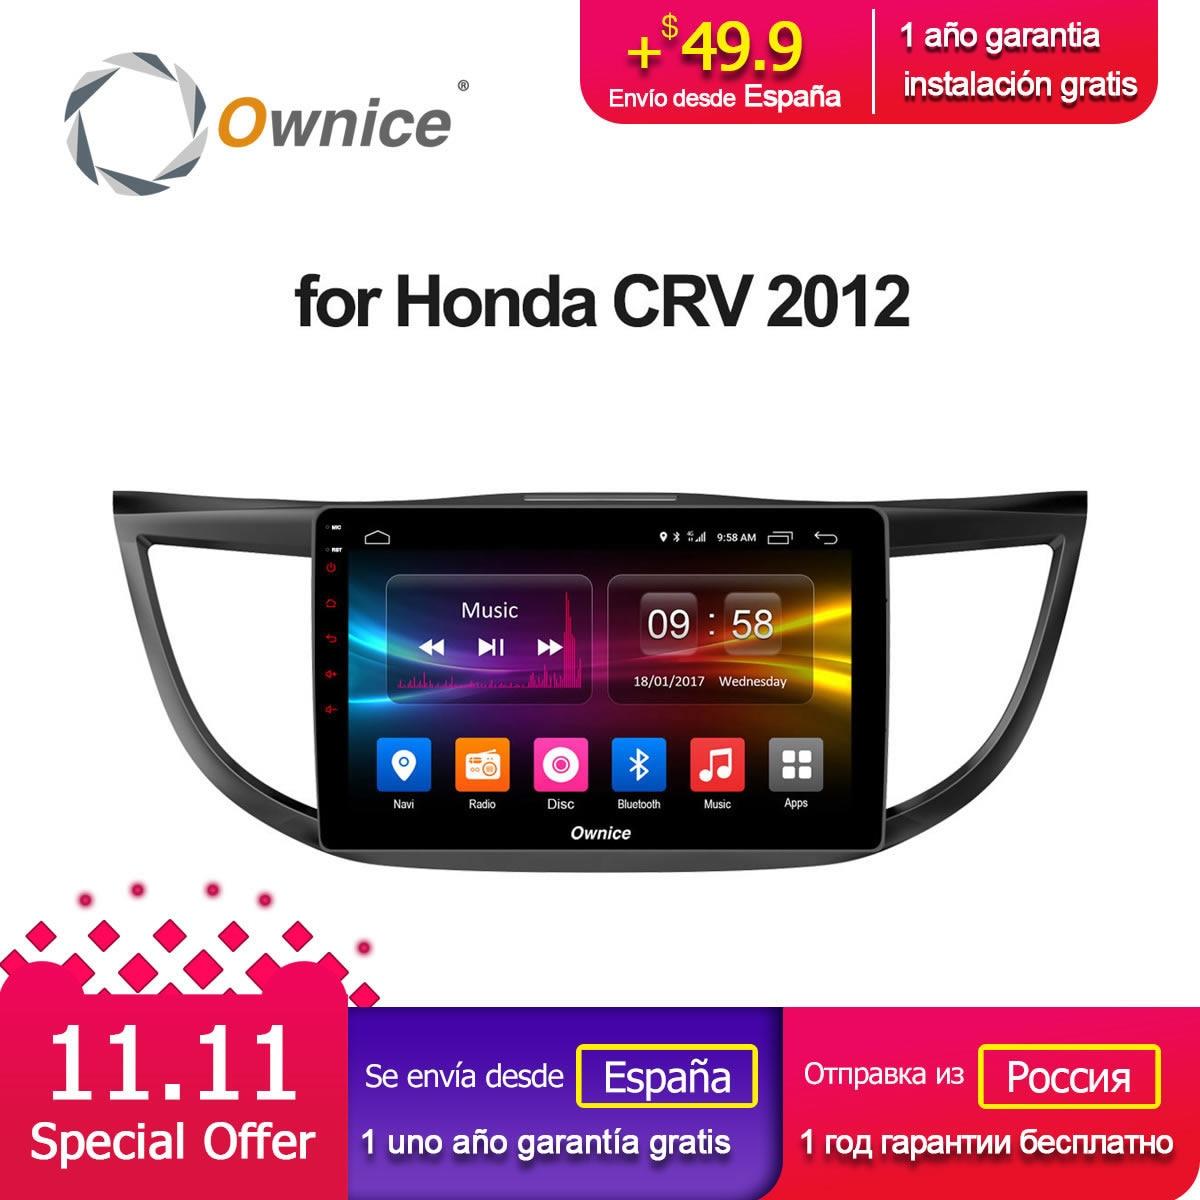 Ownice C500 + G10 Octa Core Android 8.1 Für Honda CRV 2012 2013 2014 2015 2016 Auto Radio Player Navi GPS 2 gb RAM Unterstützung DVD 4g